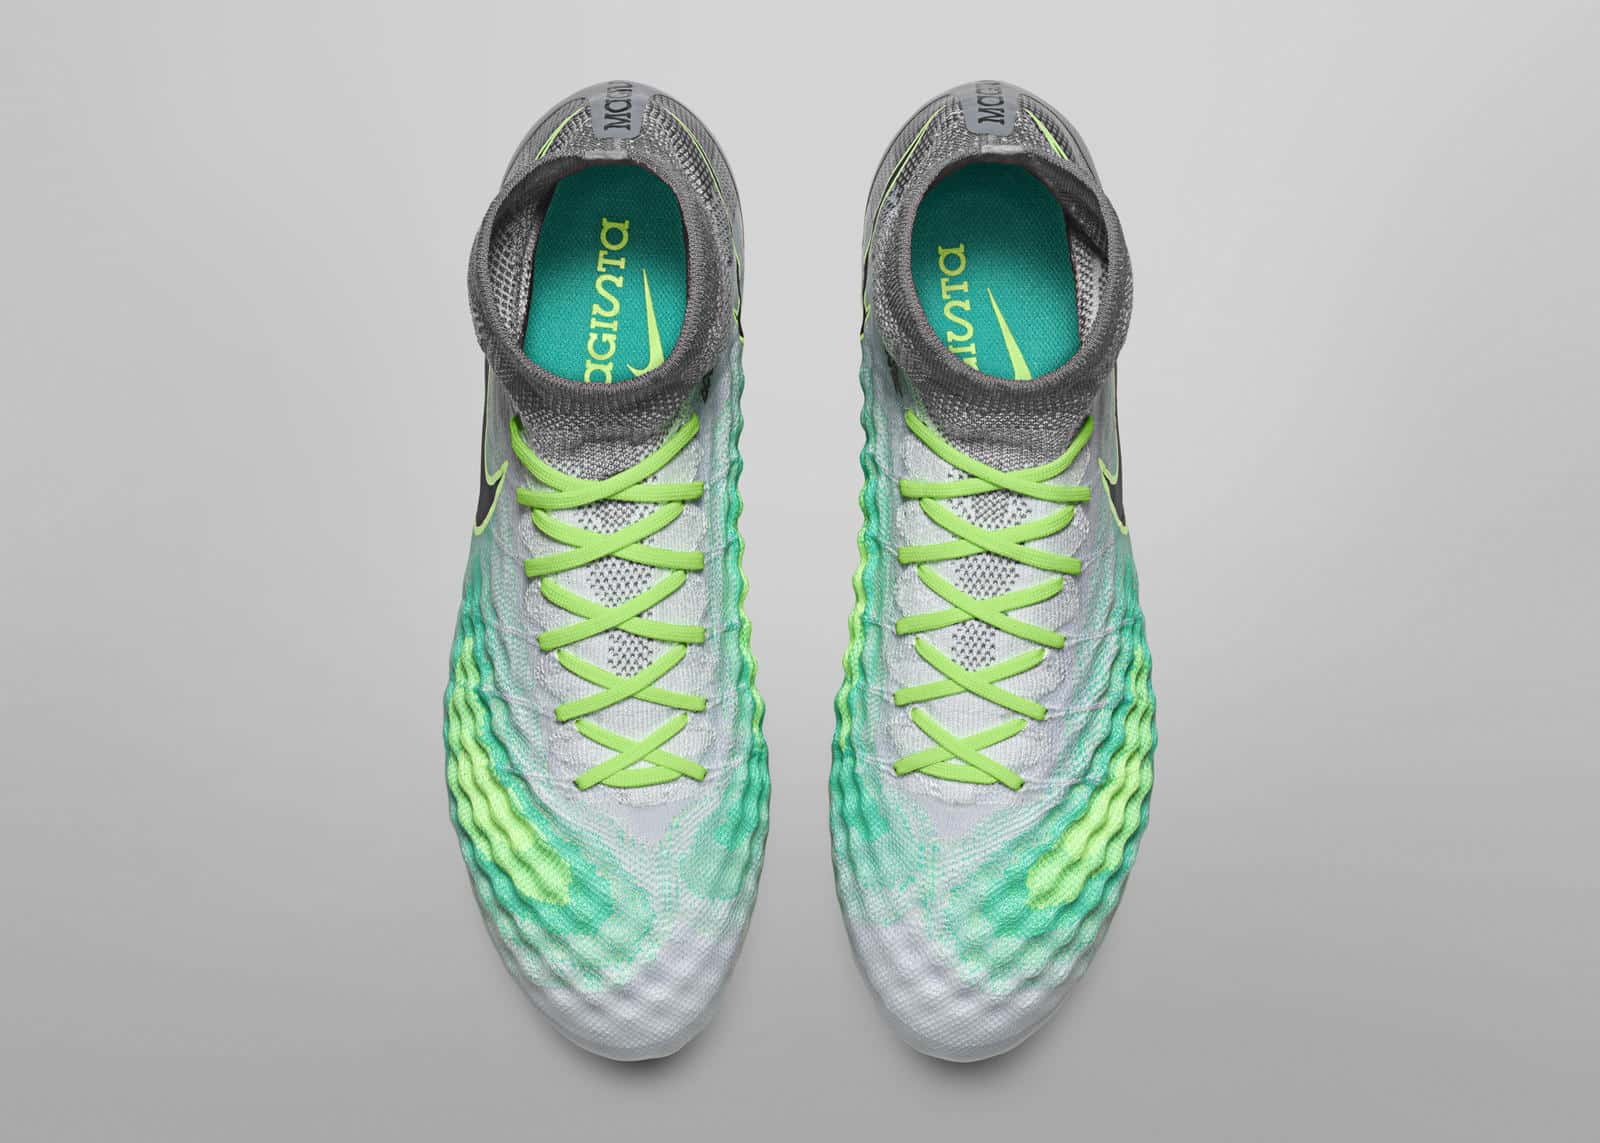 chaussure-football-nike-magista-pack-elite-juillet-2016-2